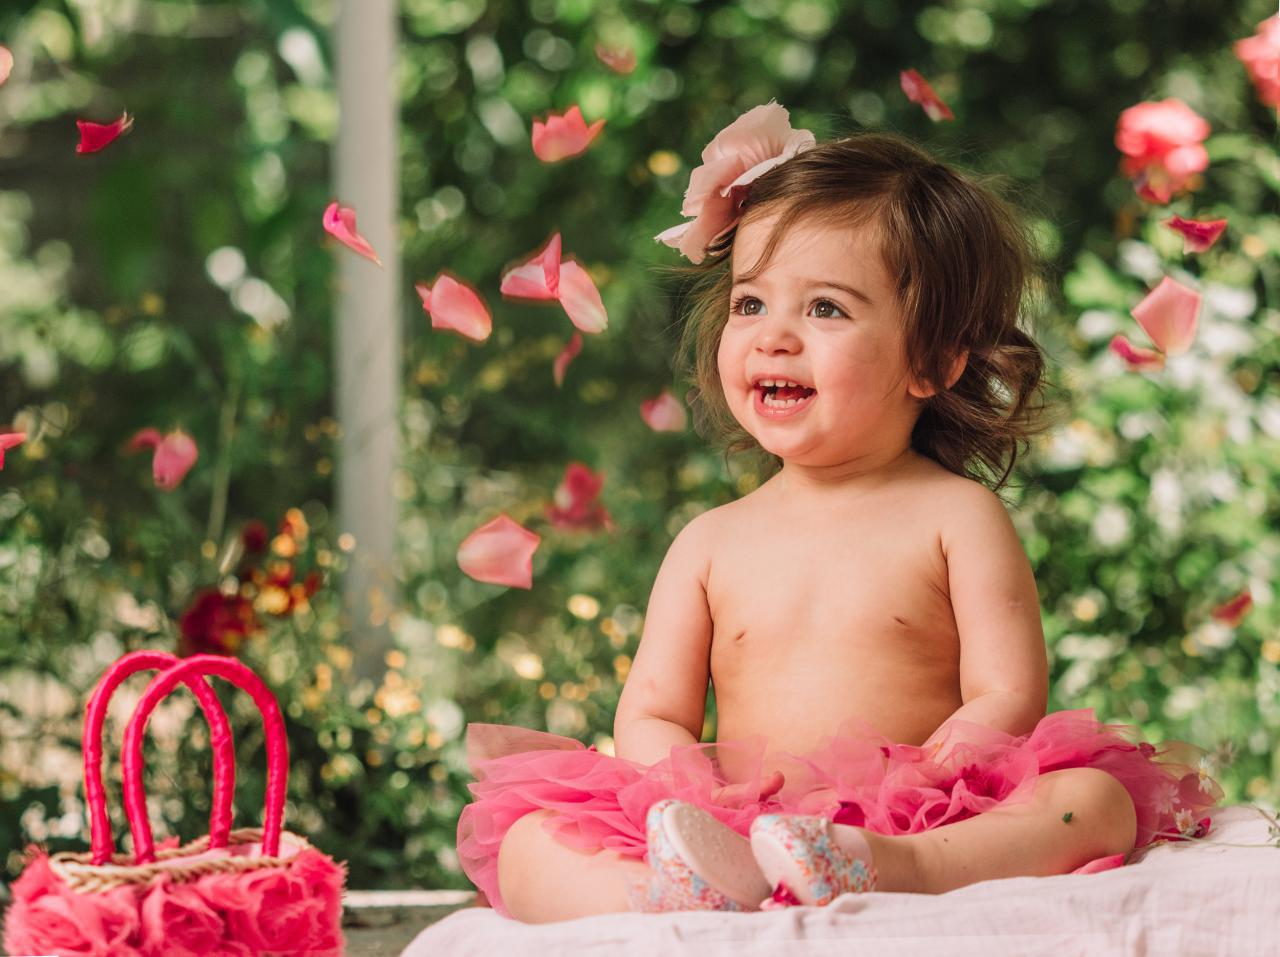 Children-Photography-9.jpg